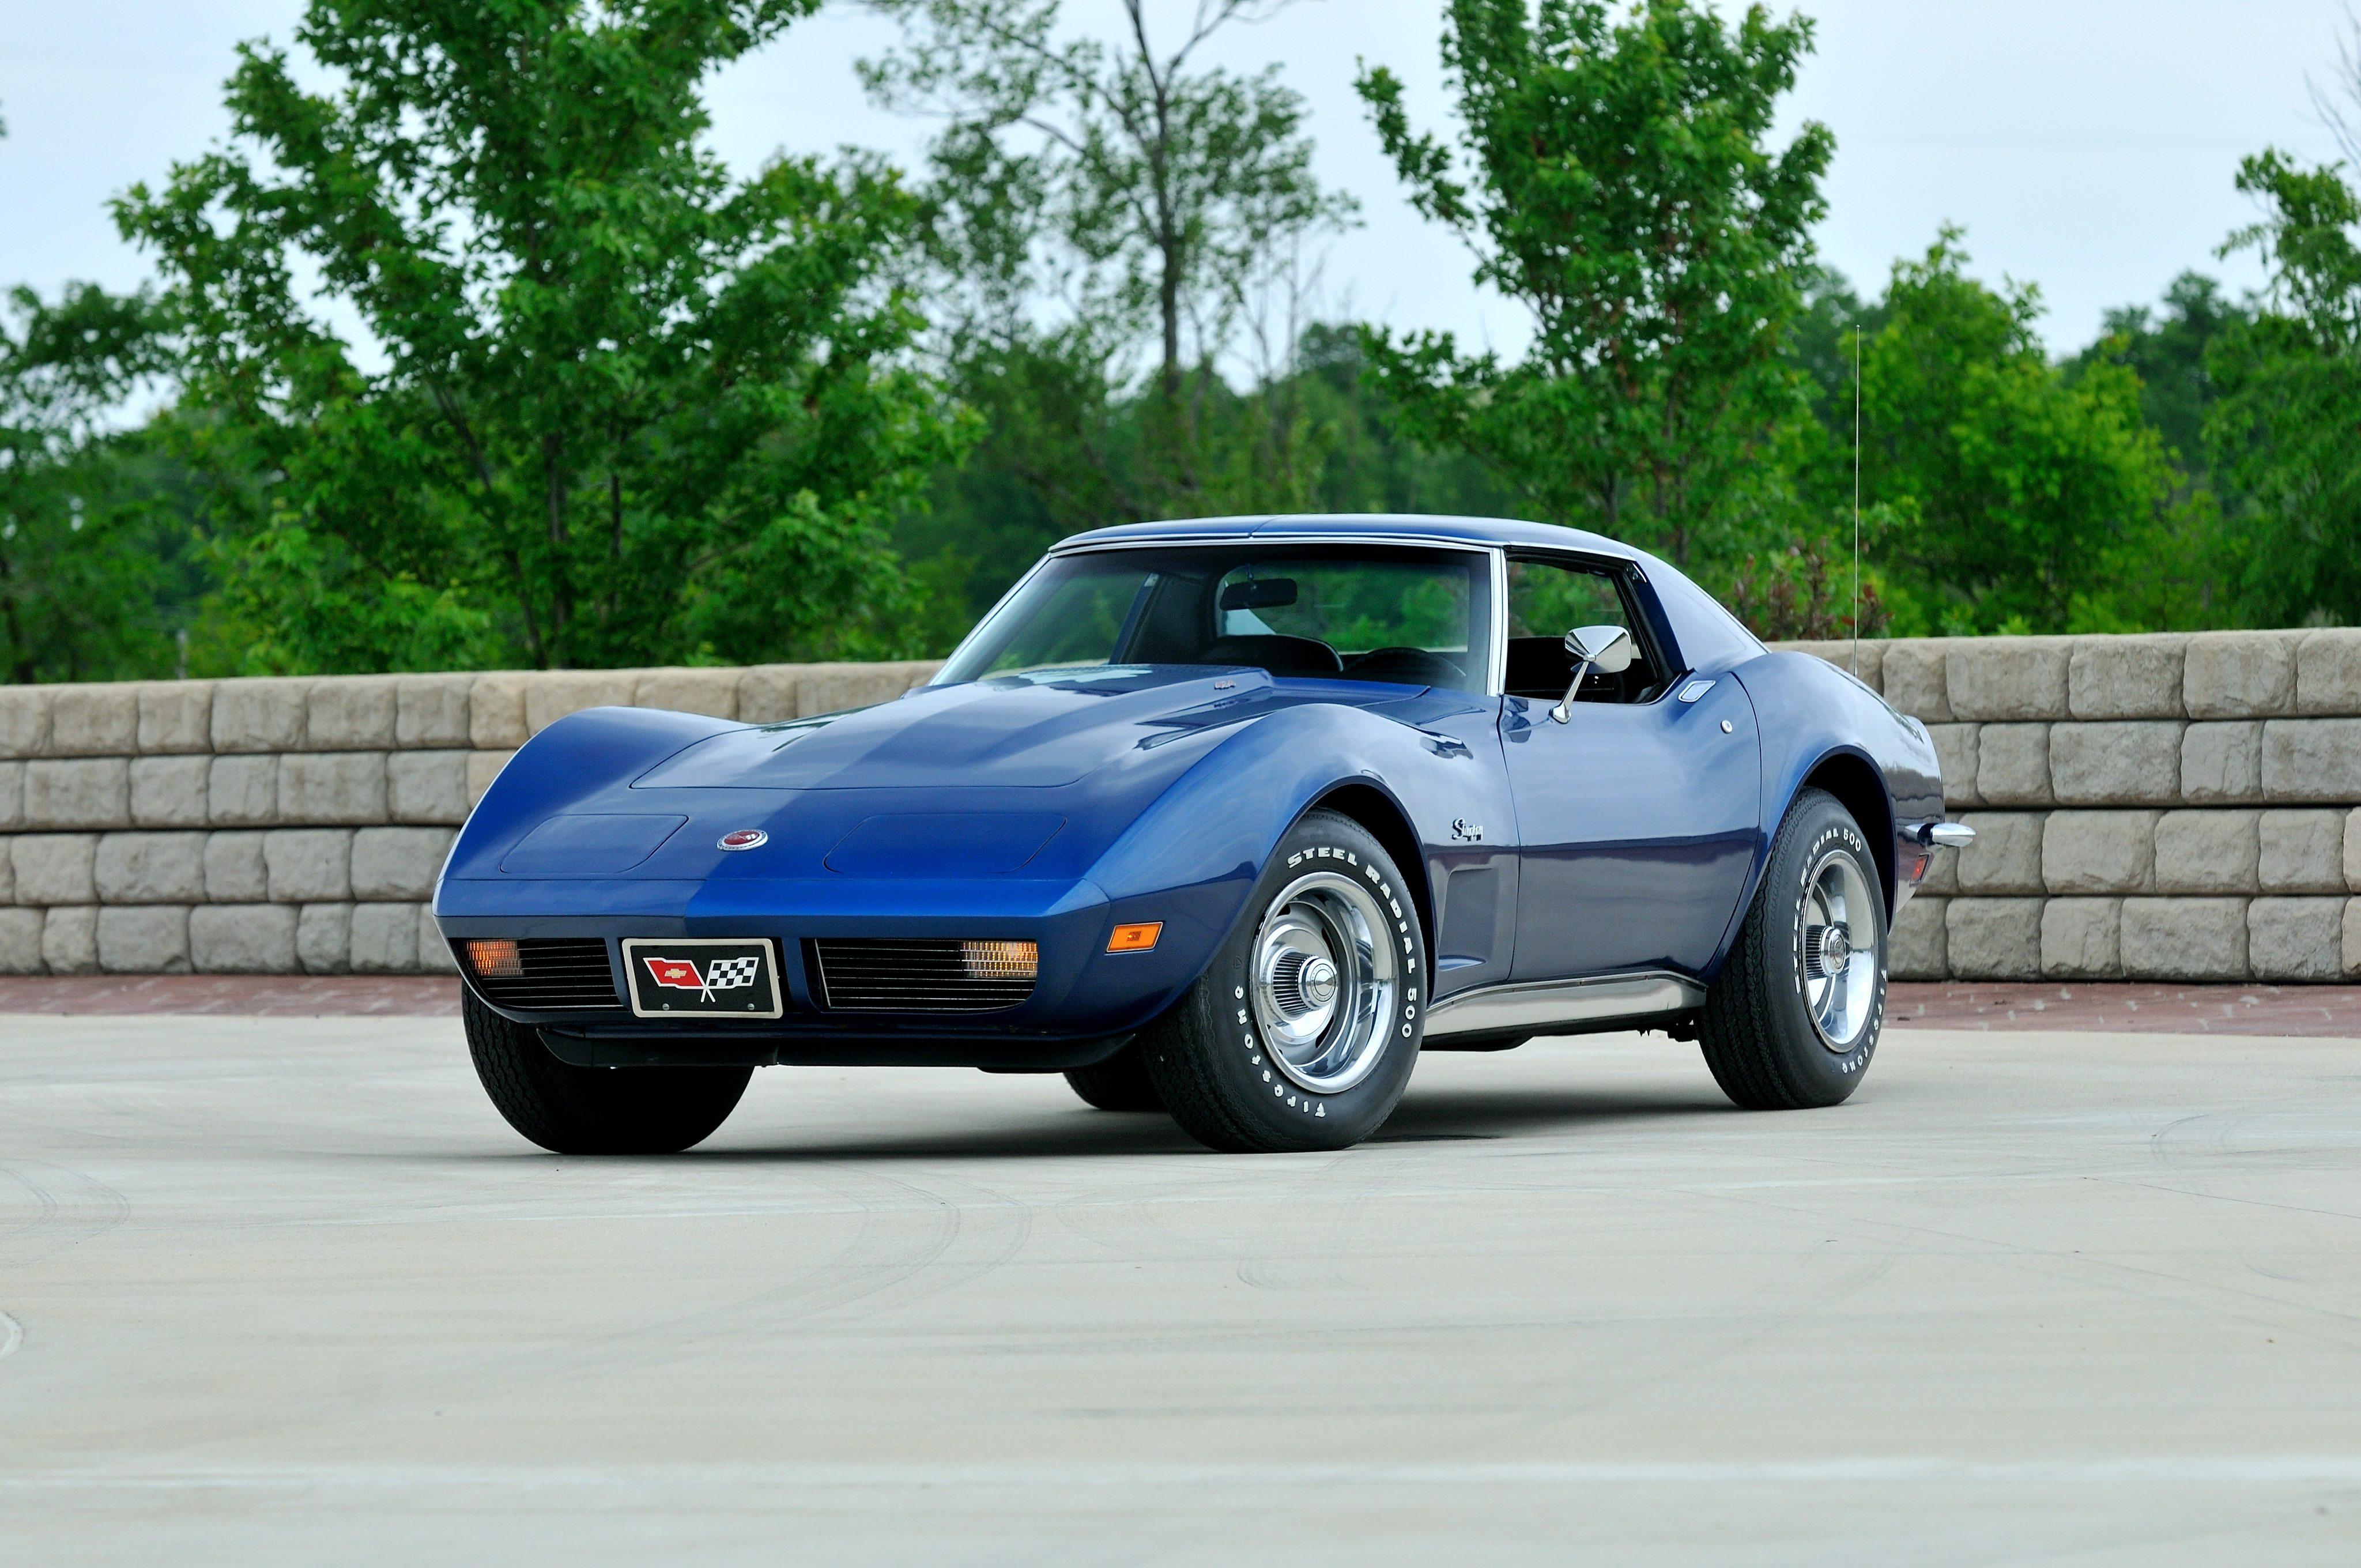 1973 C3 Corvette | Ultimate Guide (Overview, Specs, VIN Info ...